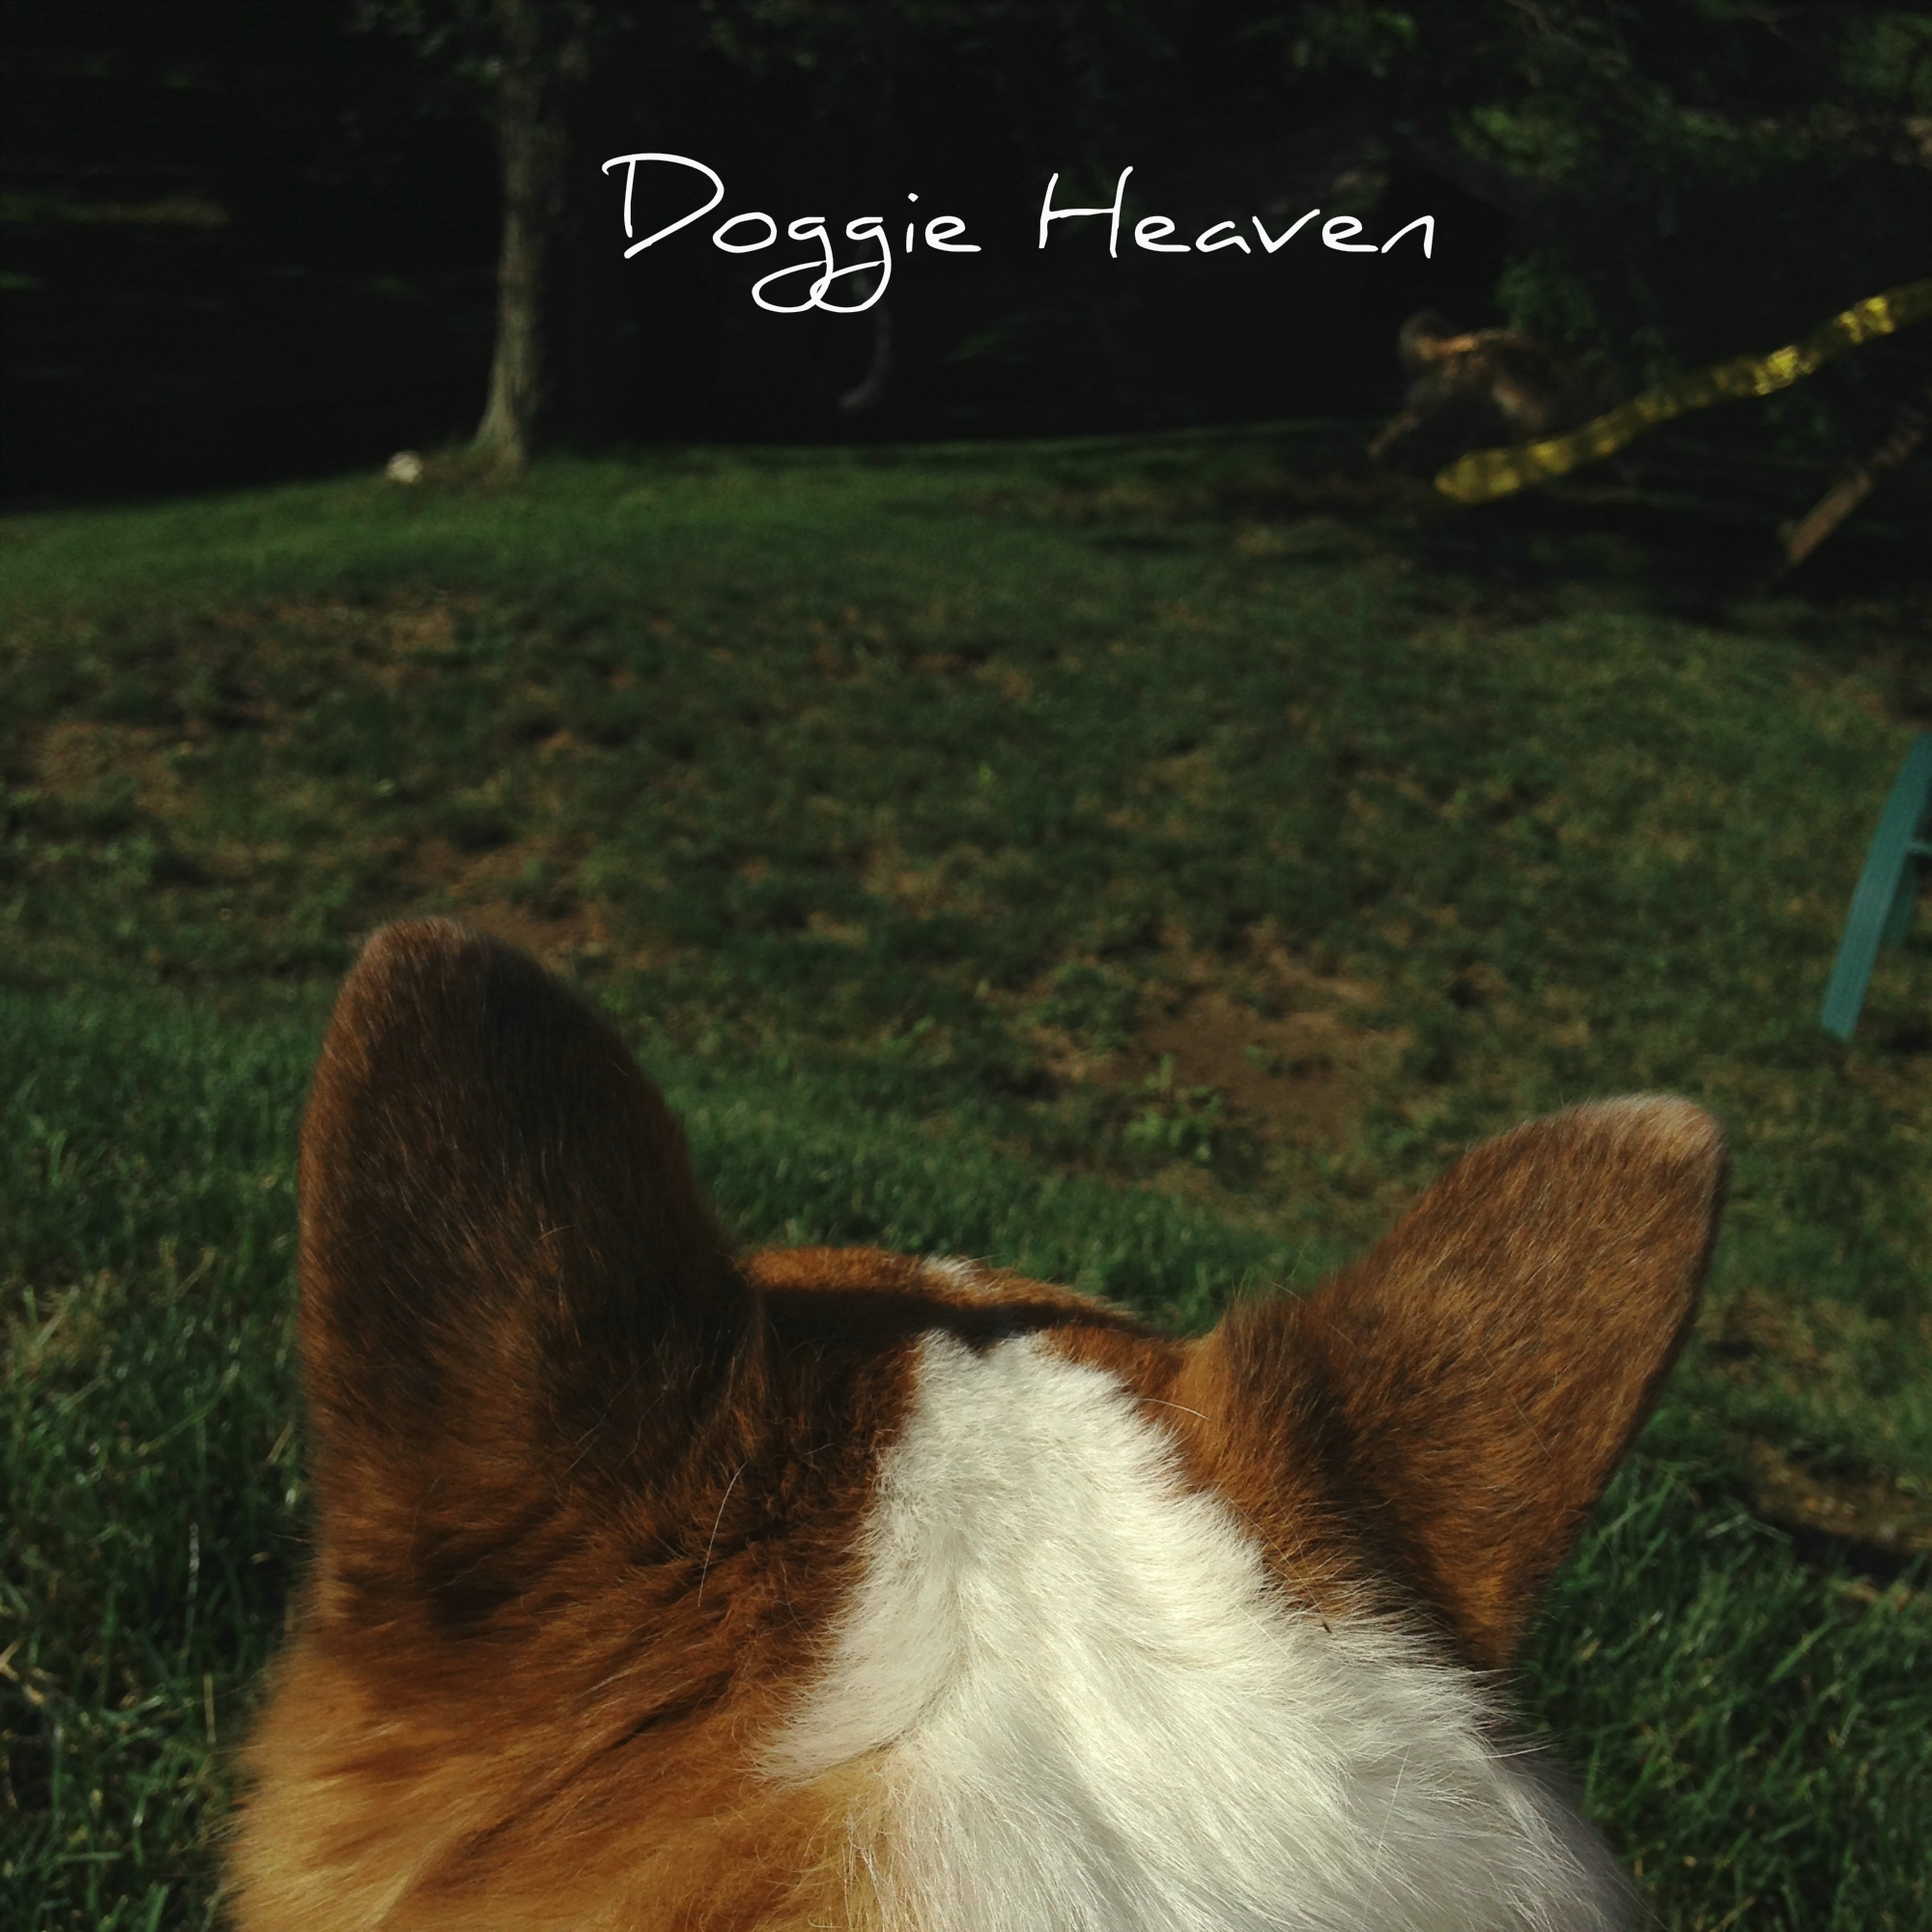 Curse Words - Doggie Heaven